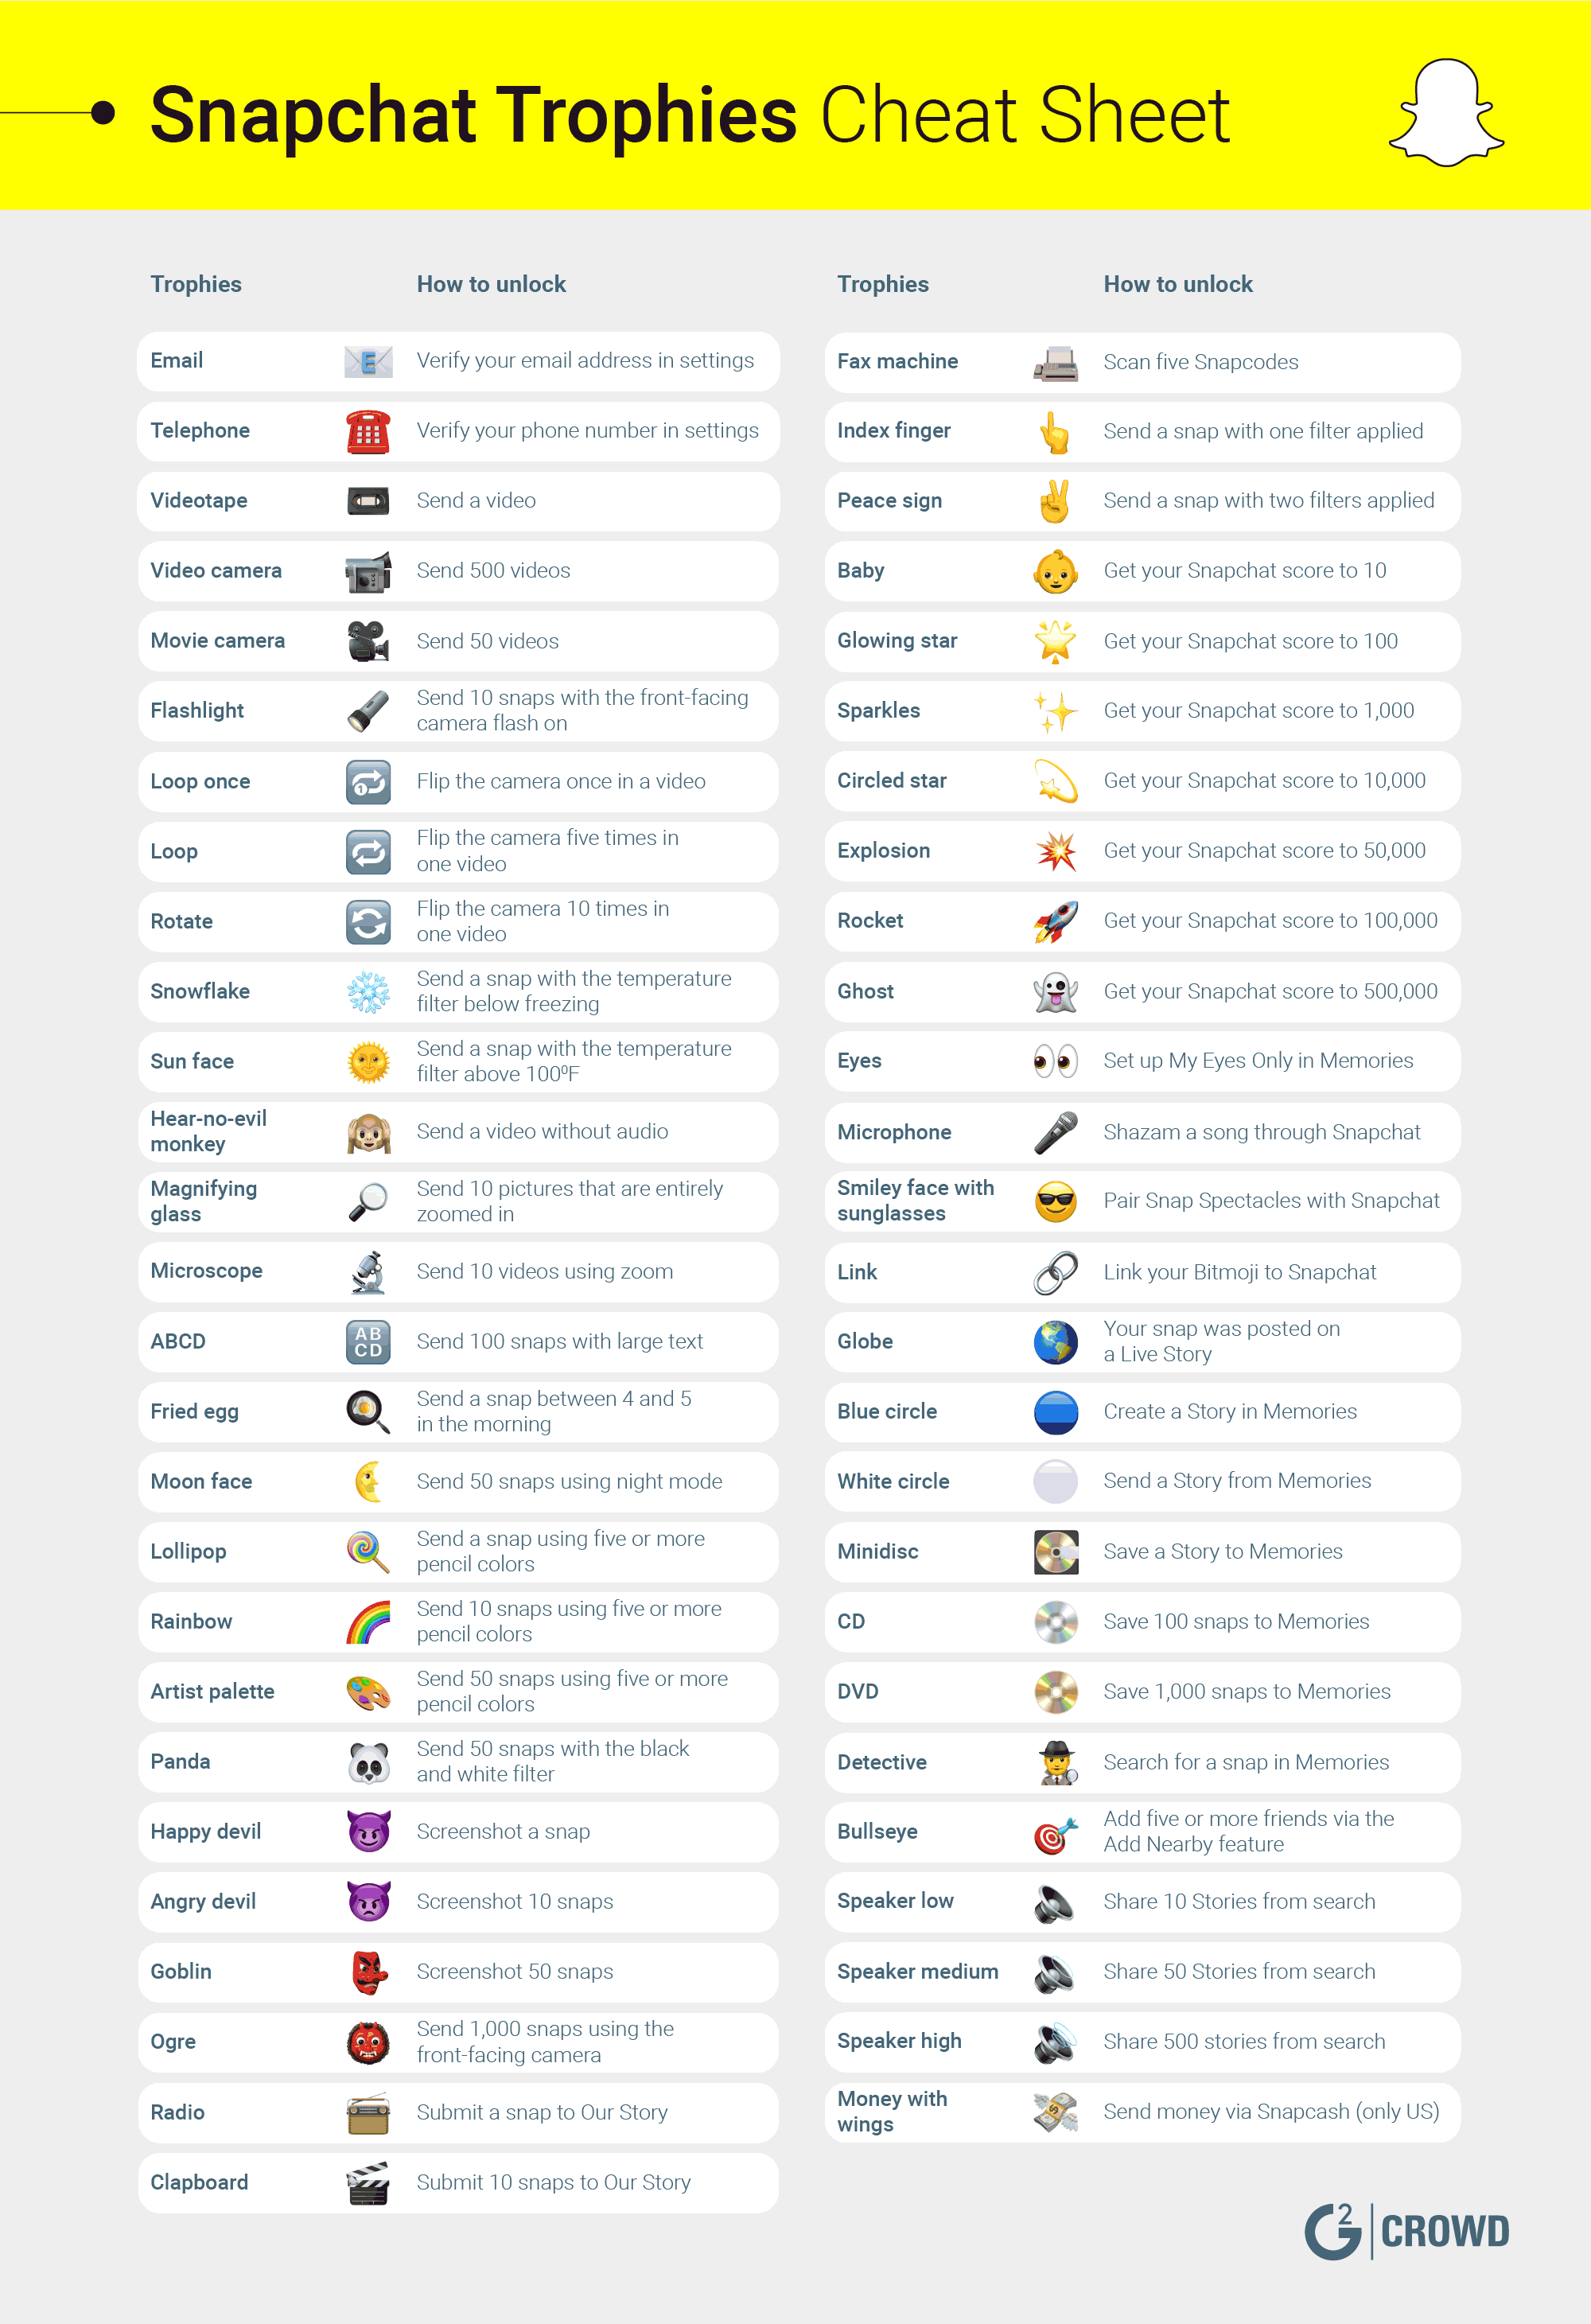 Snapchat trophies cheat sheet